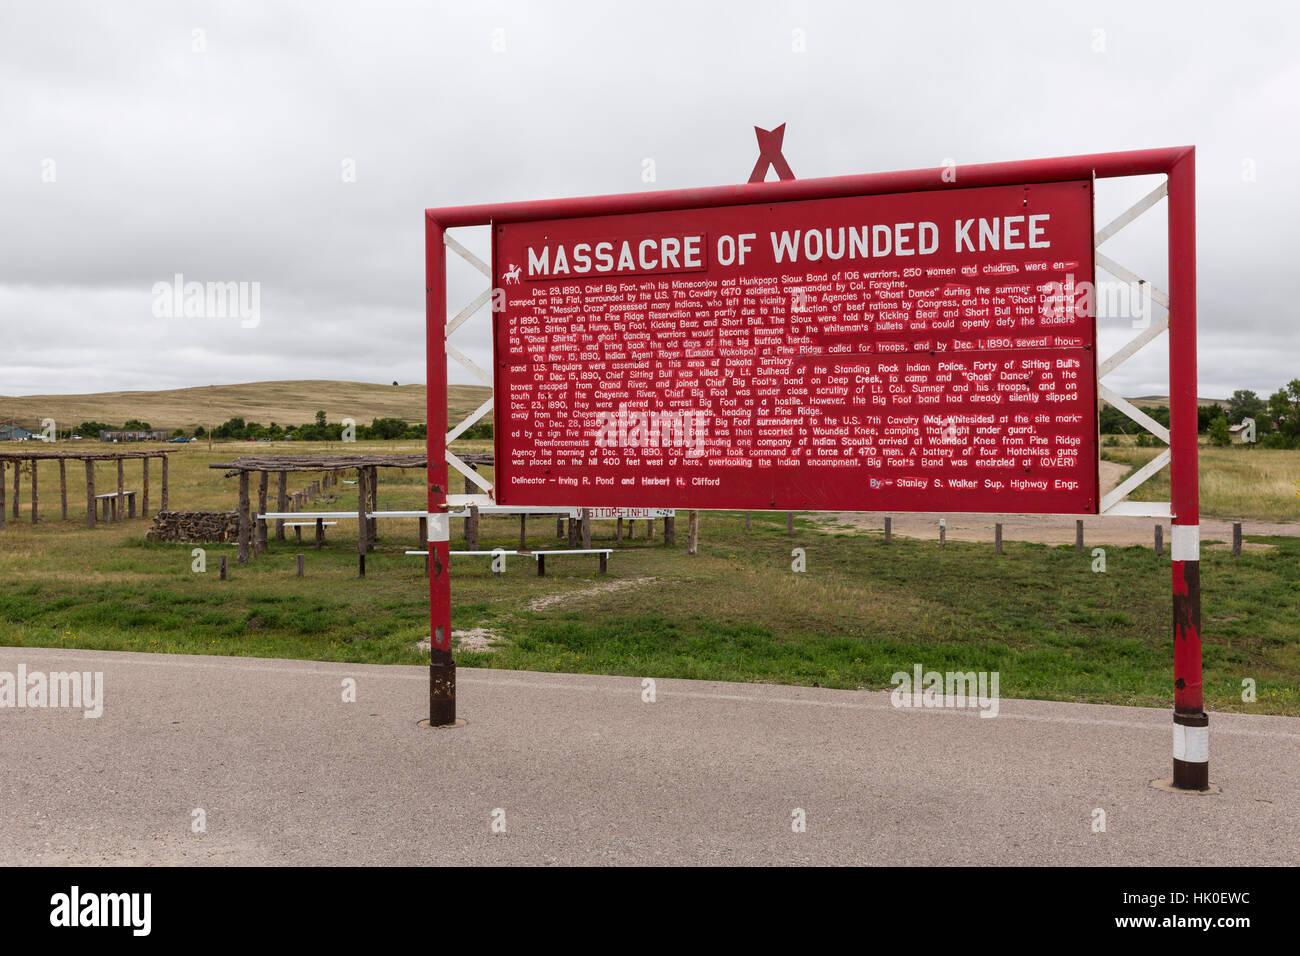 Sept, 2016. Wounded Knee Massacre site, South Dakota, USA Stock Photo